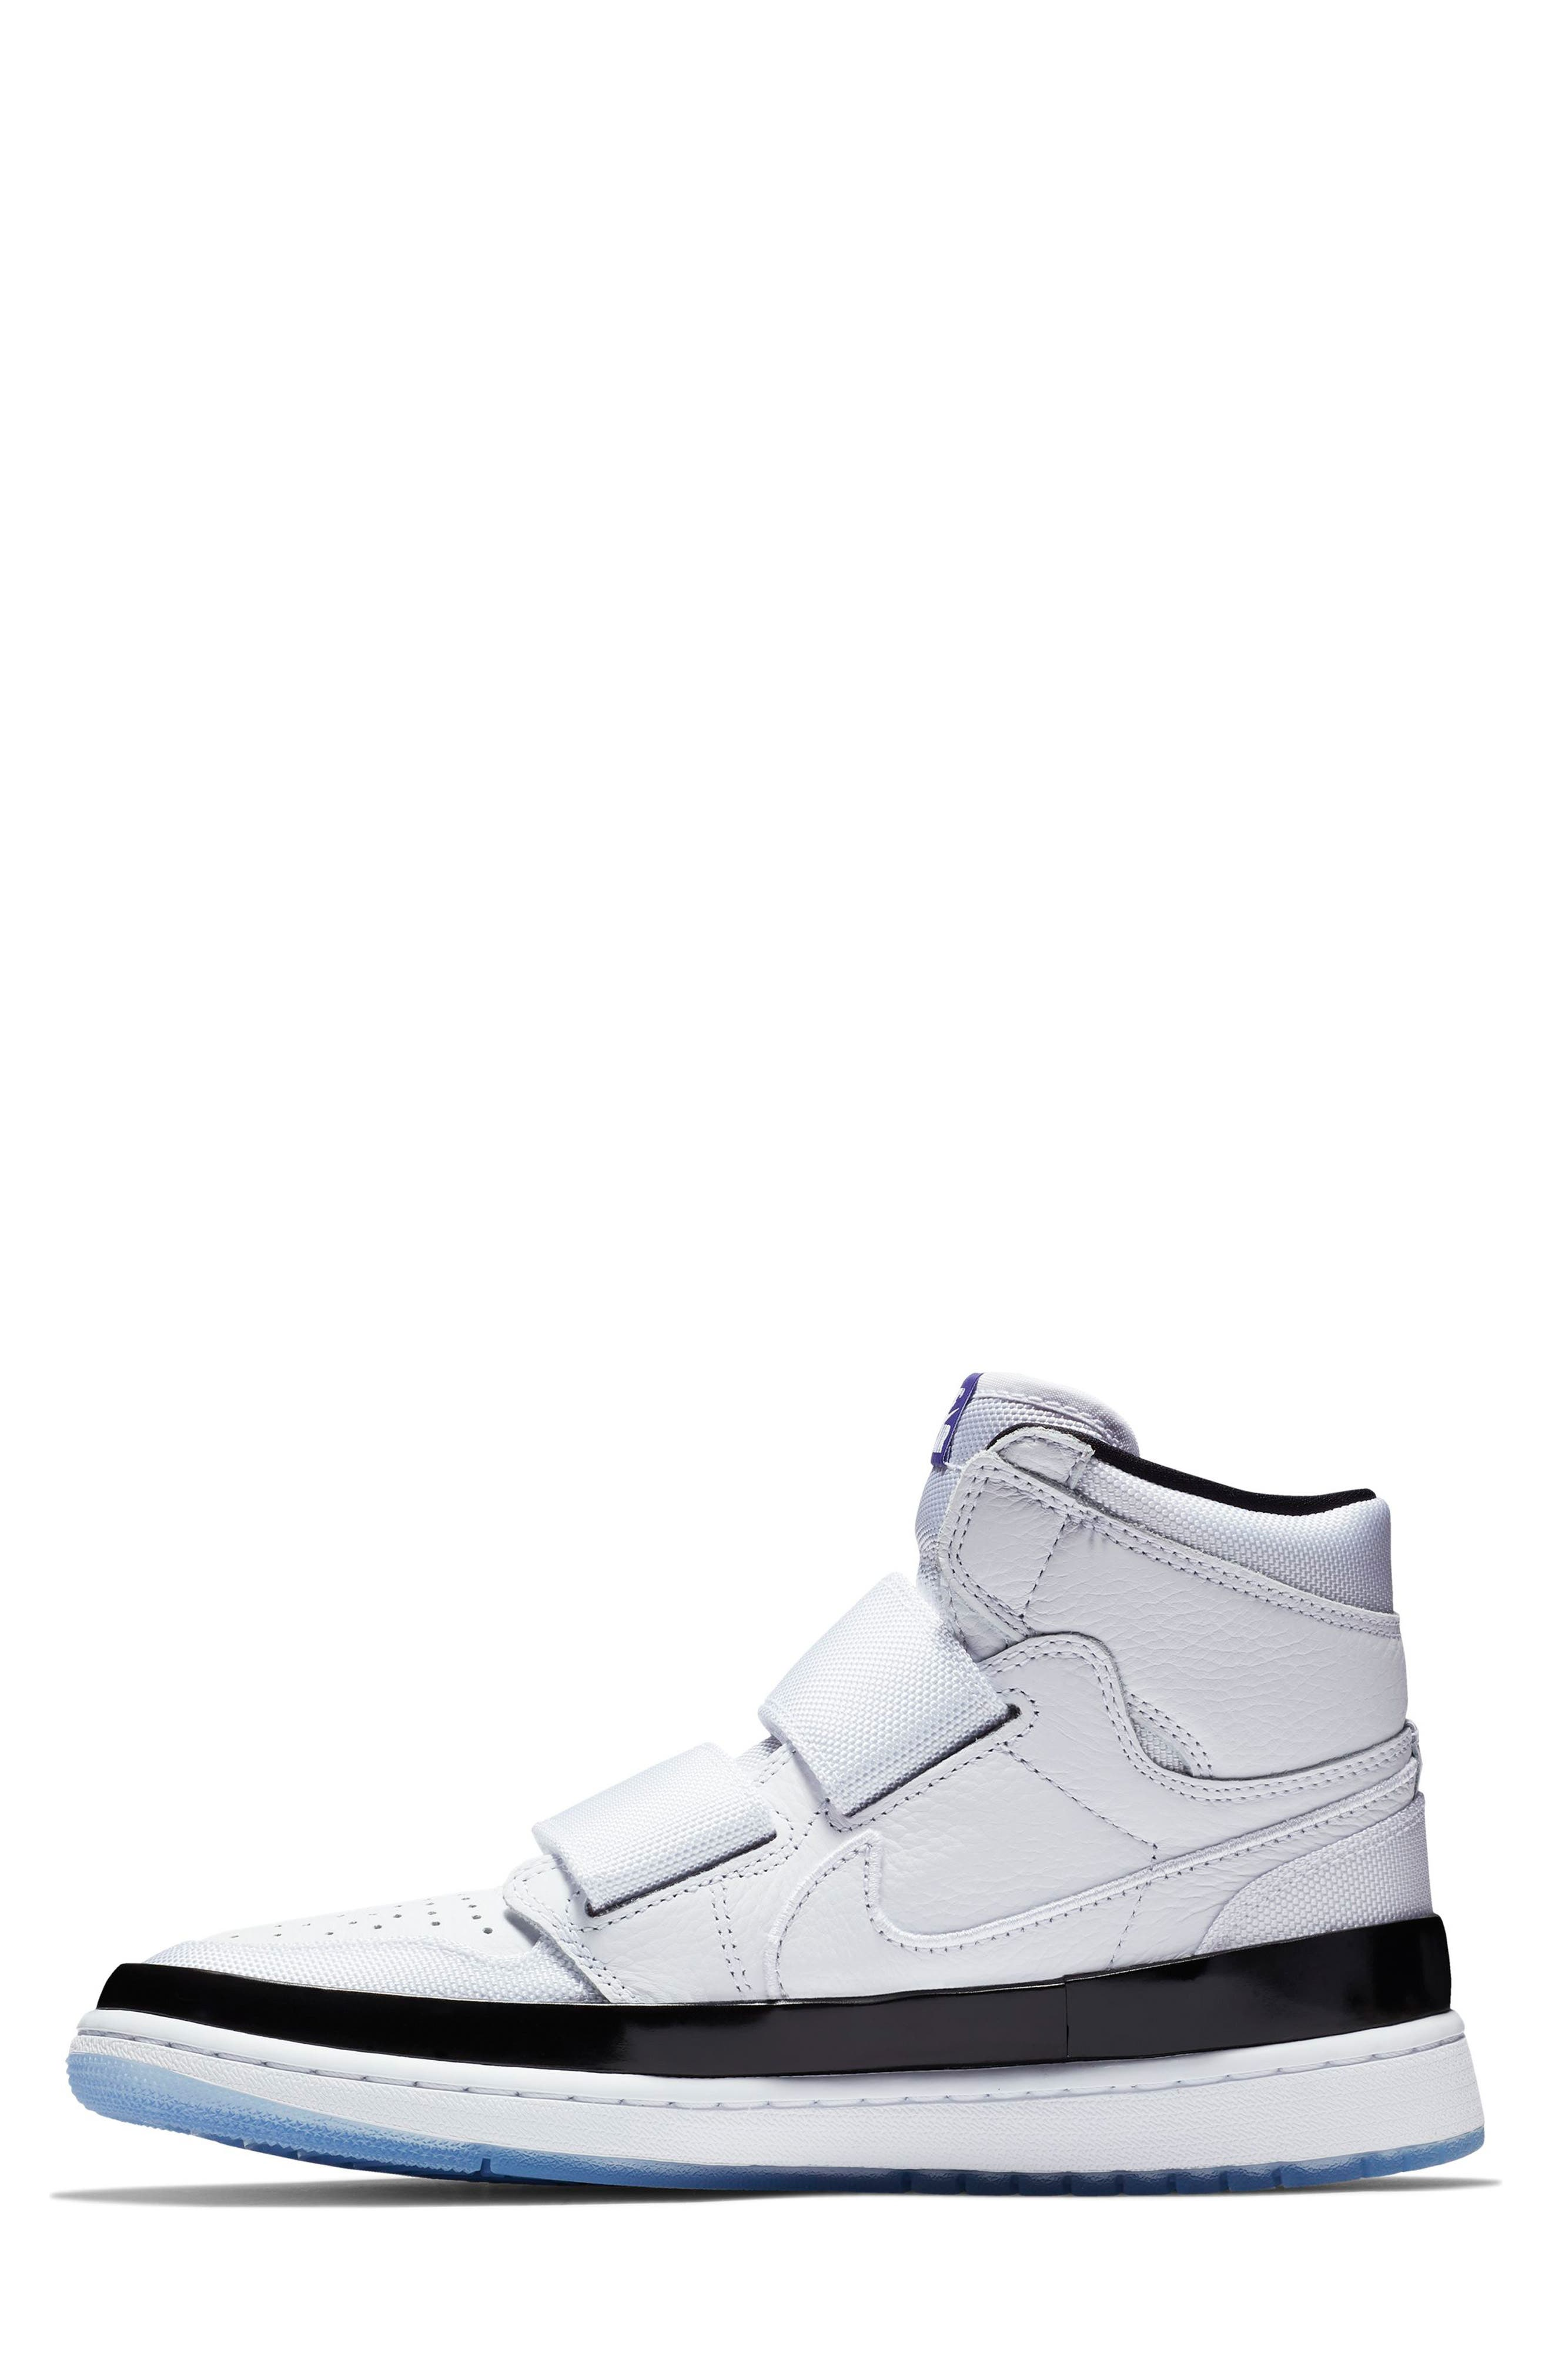 NIKE, Air Jordan 1 Retro High Double Strap Sneaker, Alternate thumbnail 6, color, WHITE/ DARK CONCORD/ BLACK